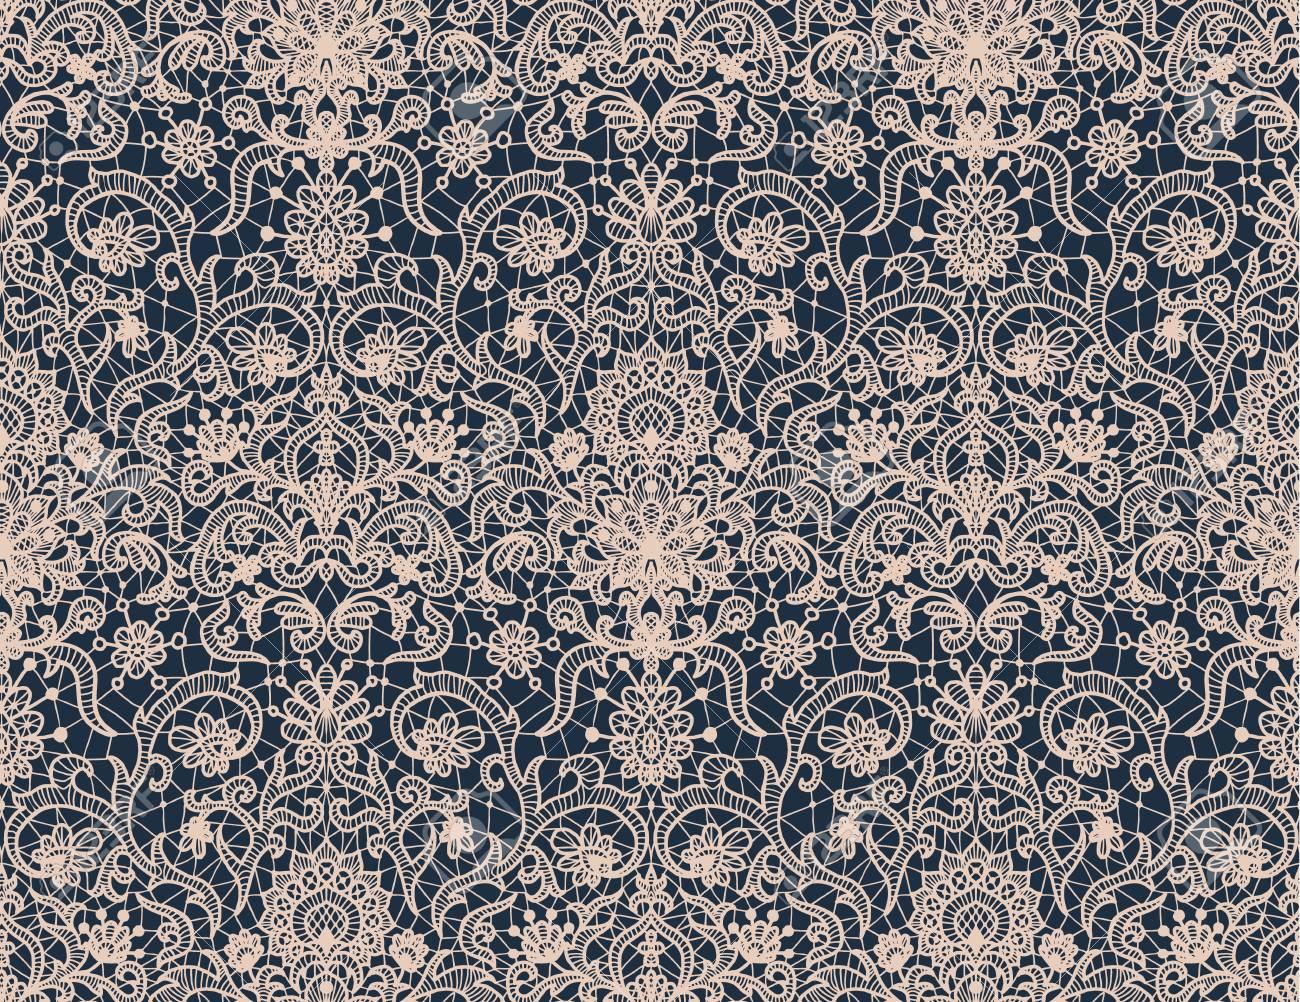 Seamless white lace - 110107999